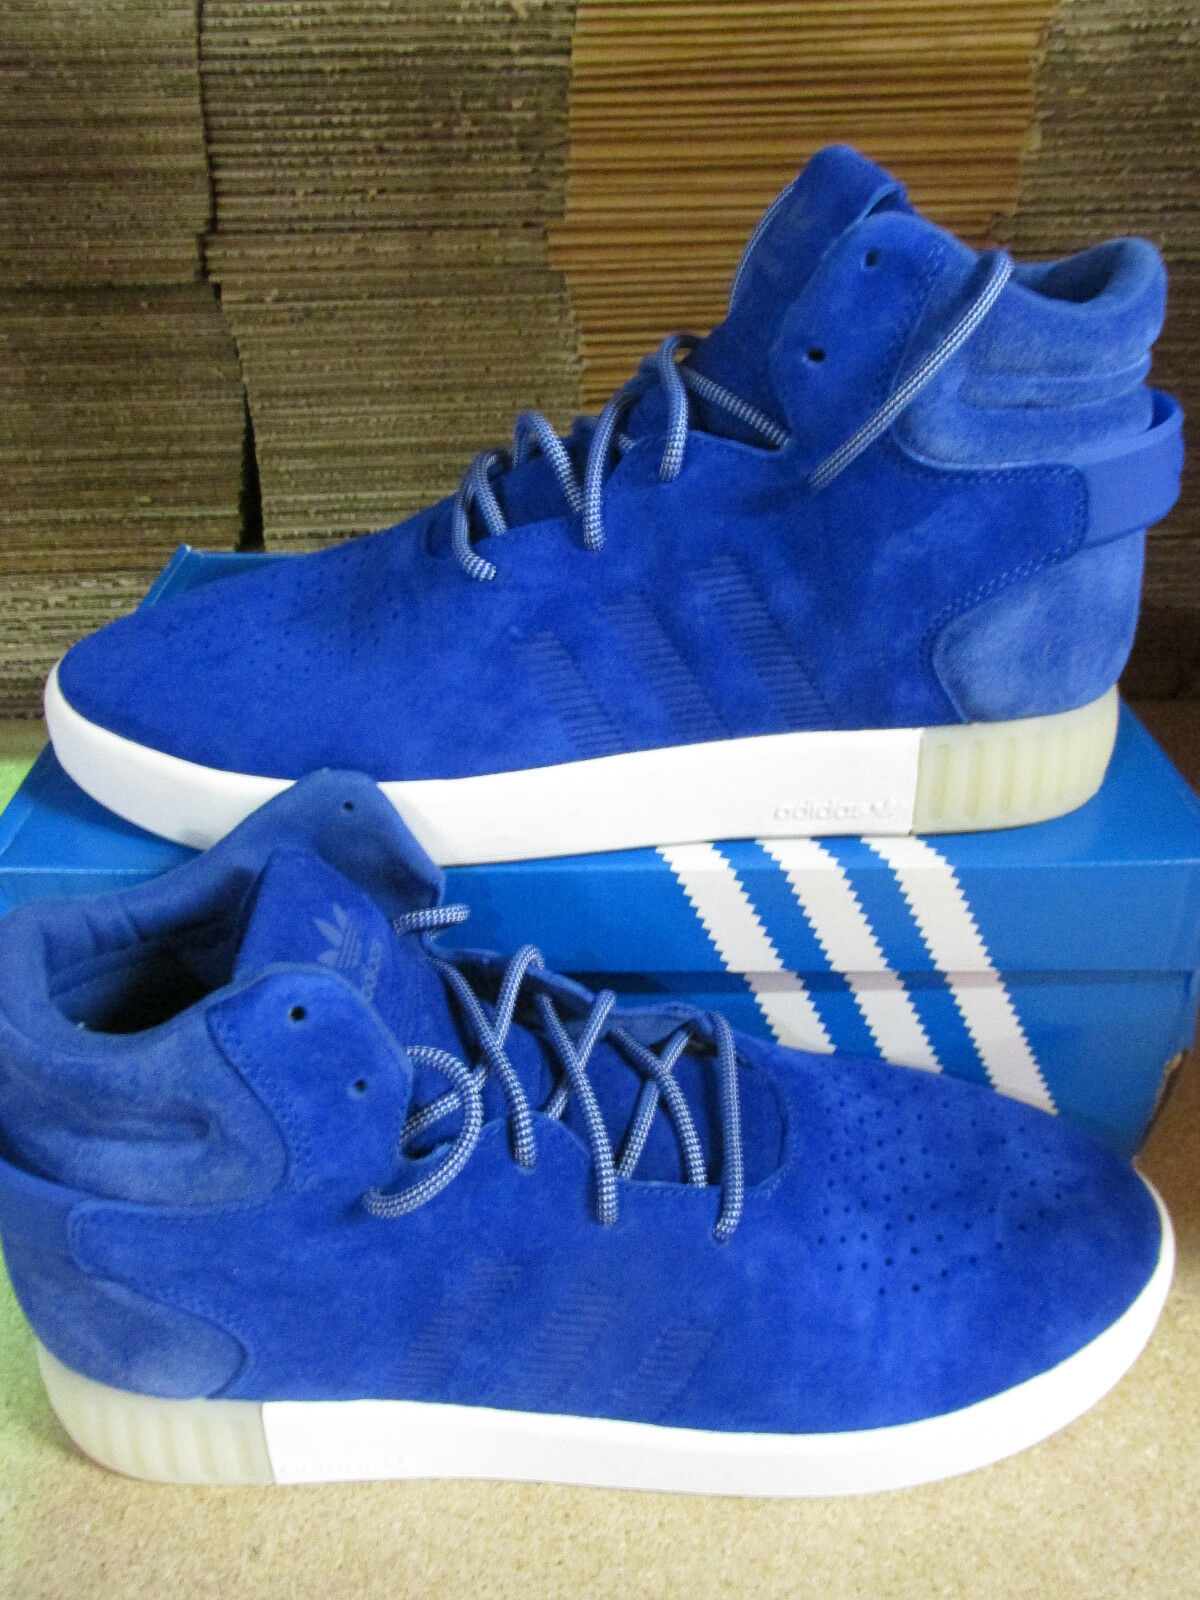 Adidas Originales Entrenadores Tubular invasor para Hombre Hi Top Entrenadores Originales BA9363 Tenis Zapatos 21a6b7